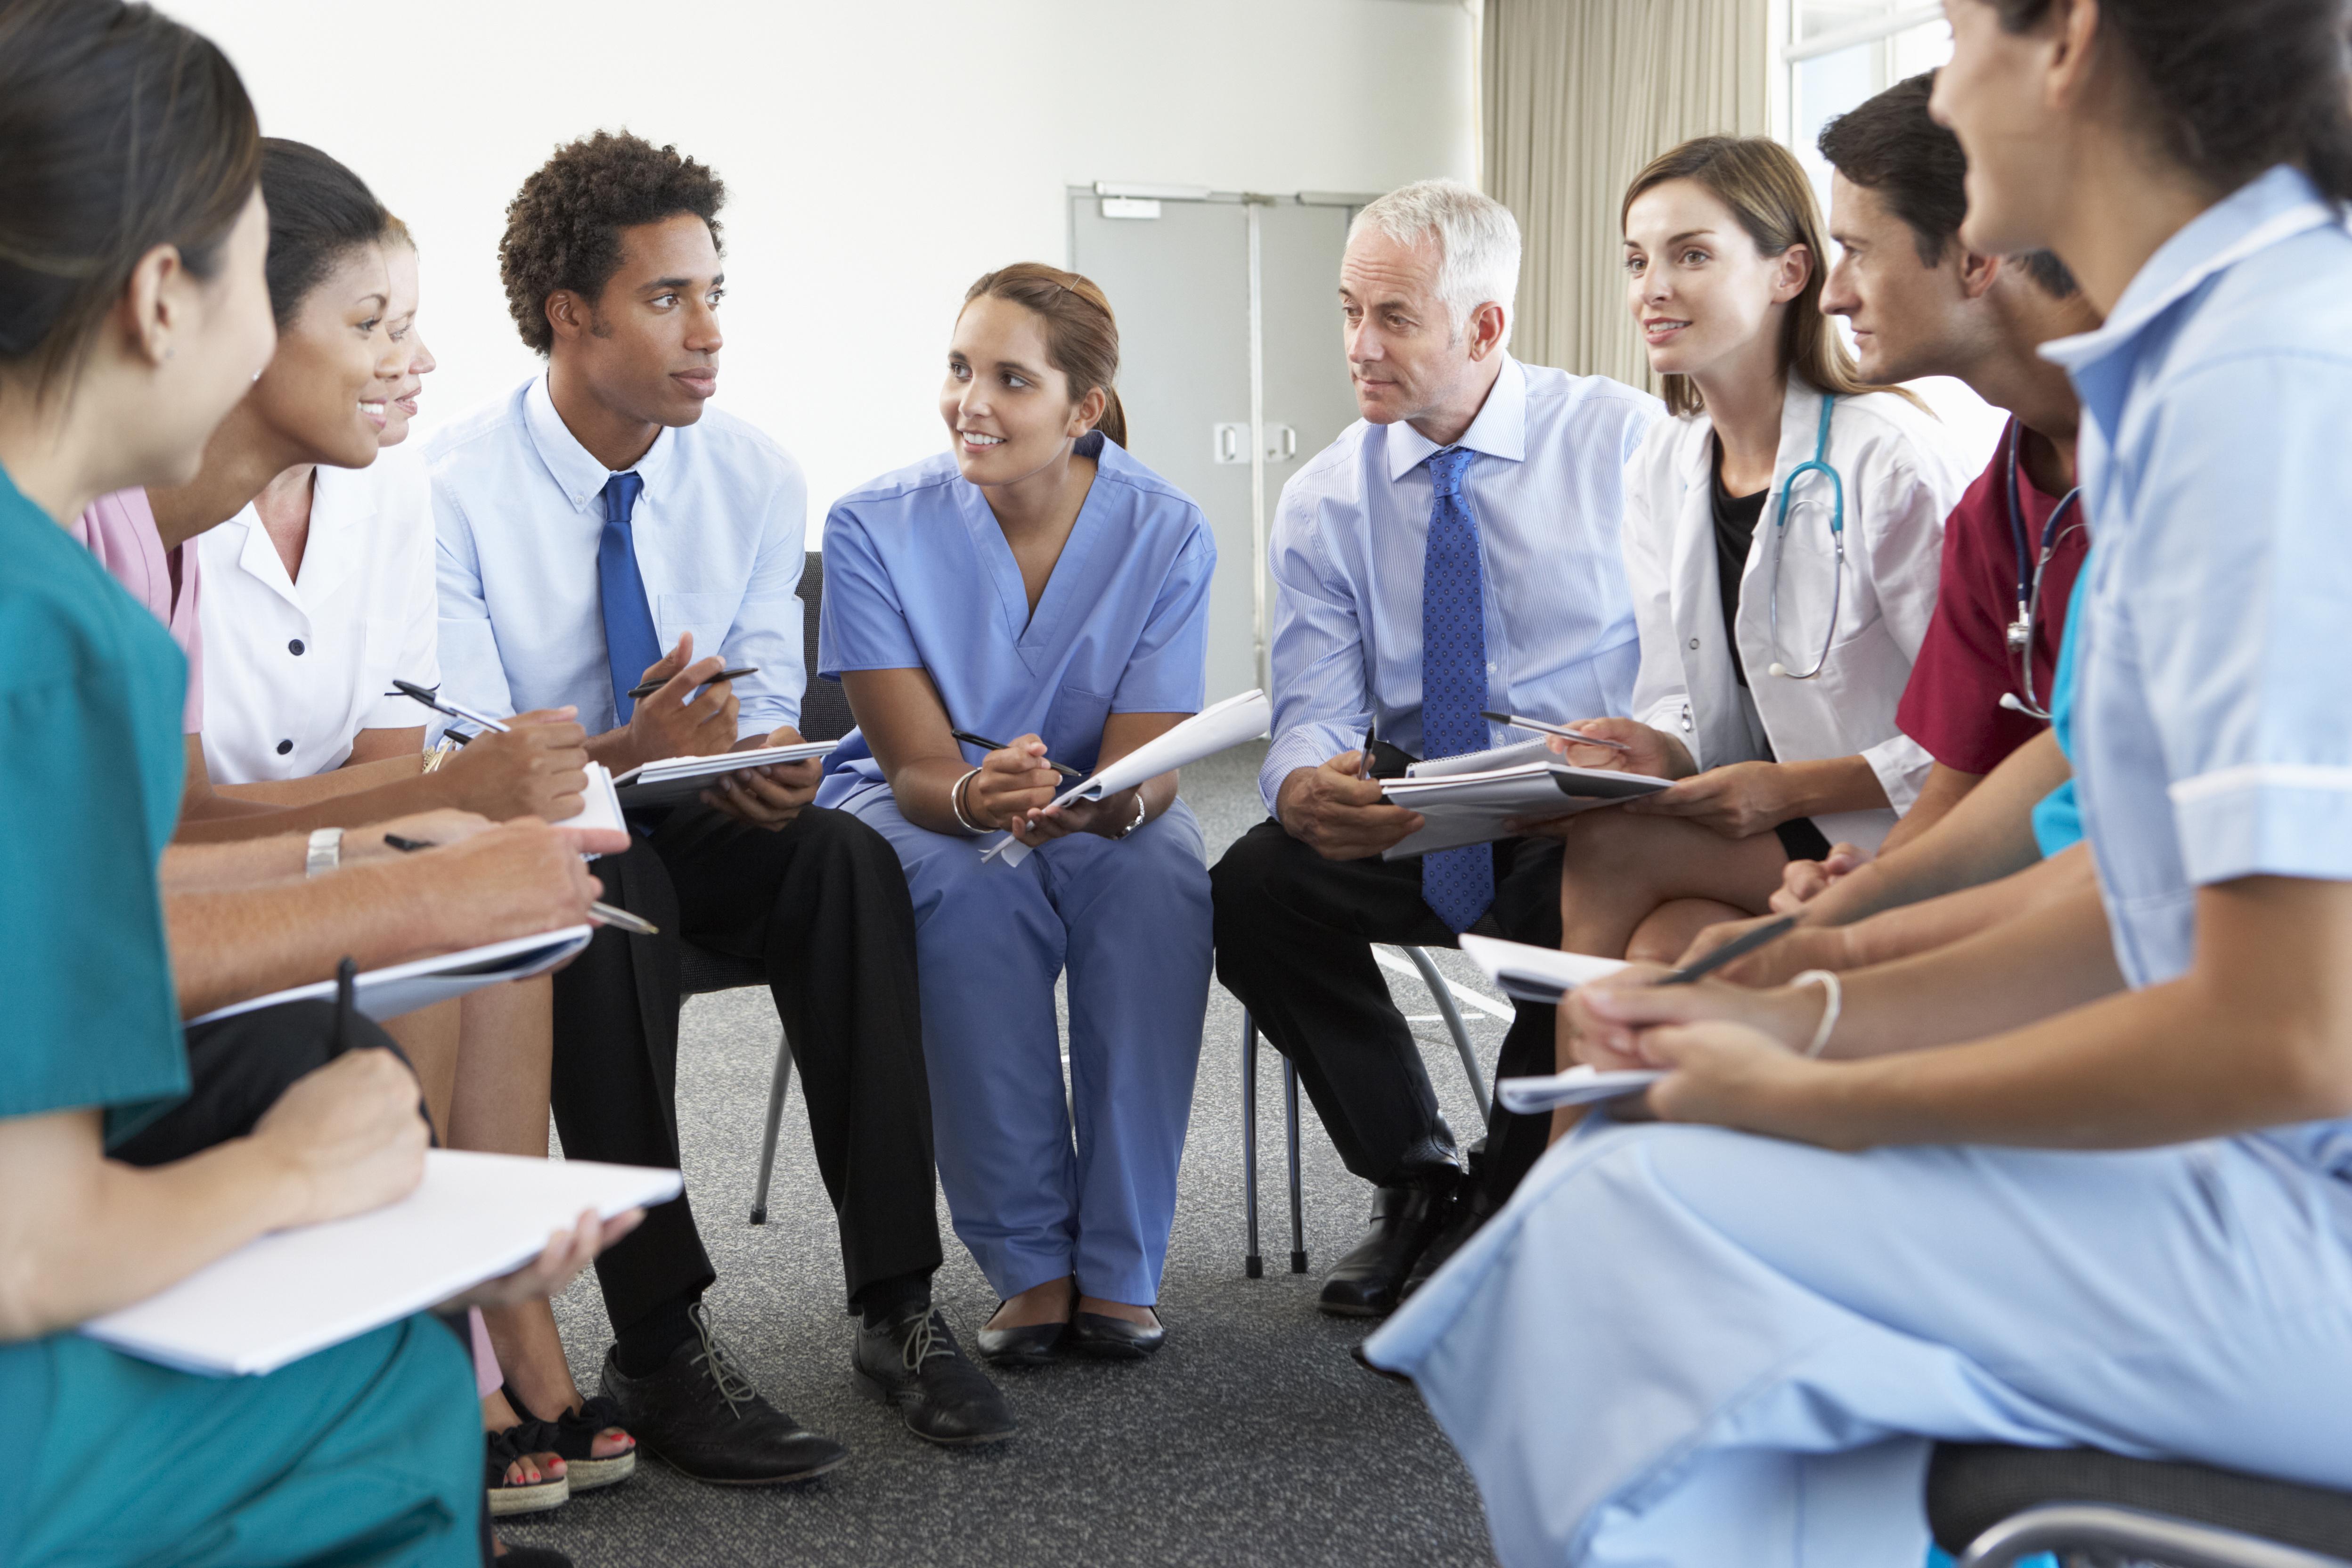 Doctors in a meeting room